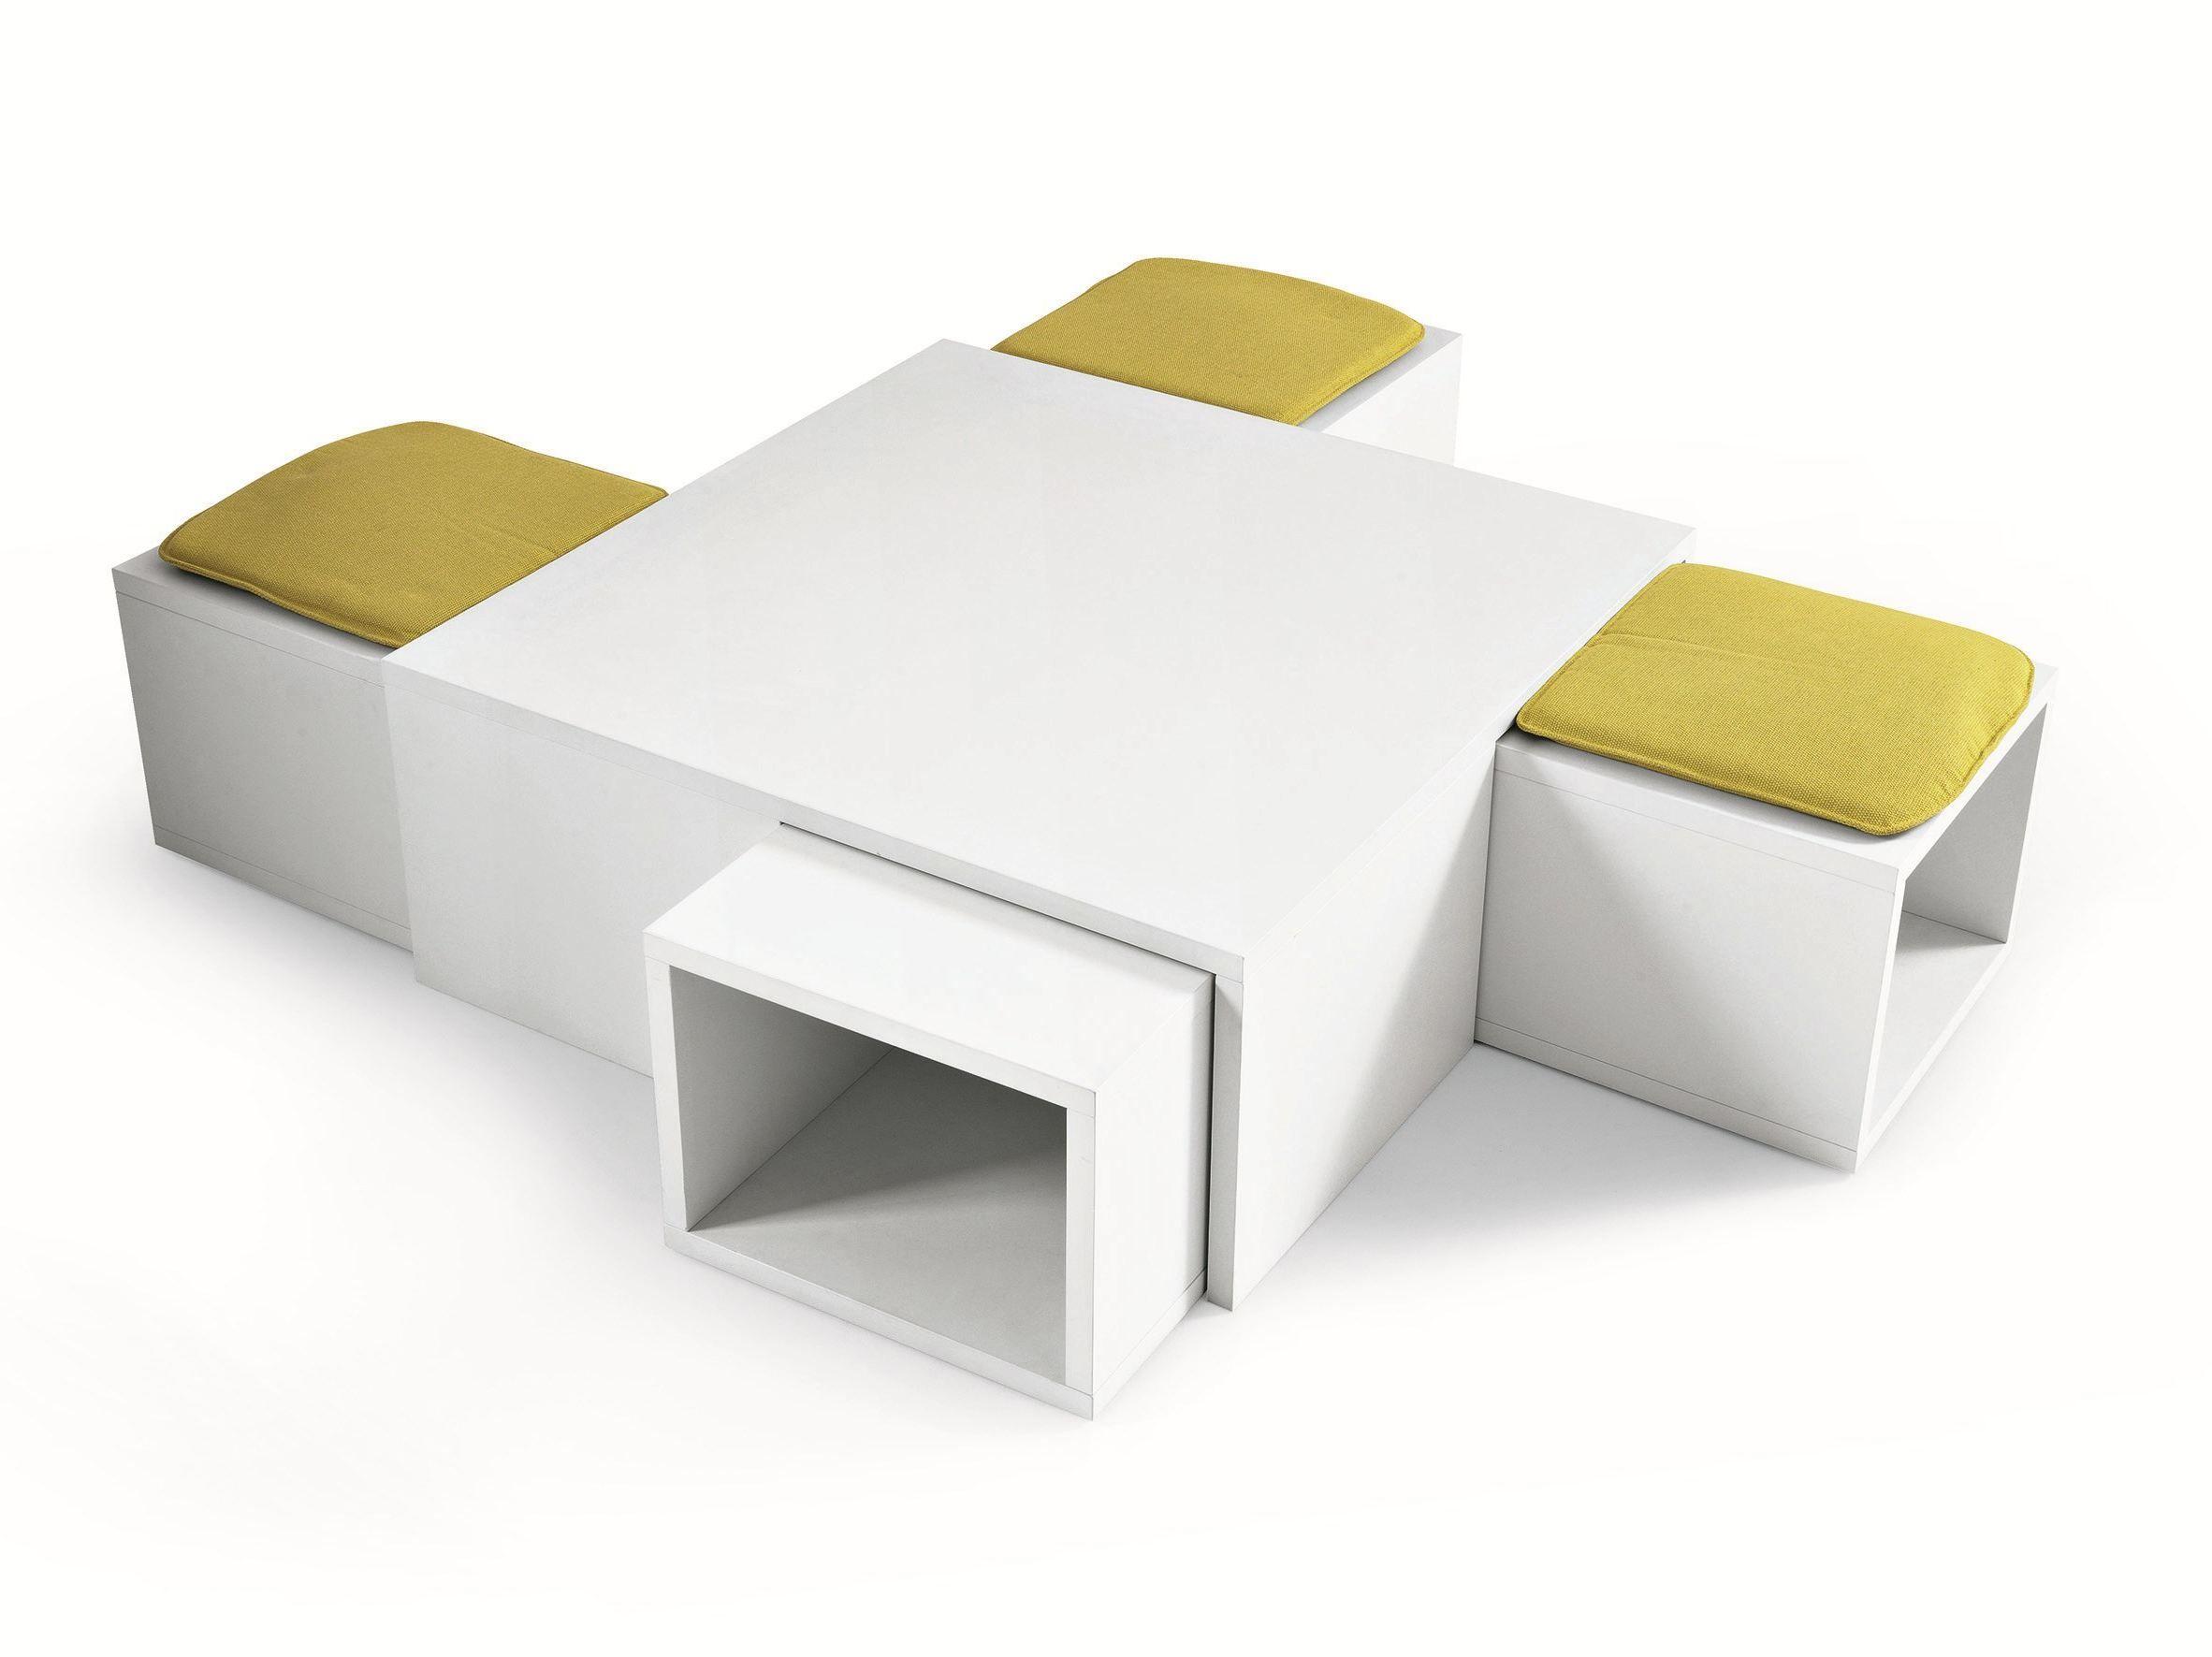 KESSLER | Coffee table By MisuraEmme design Mauro Lipparini